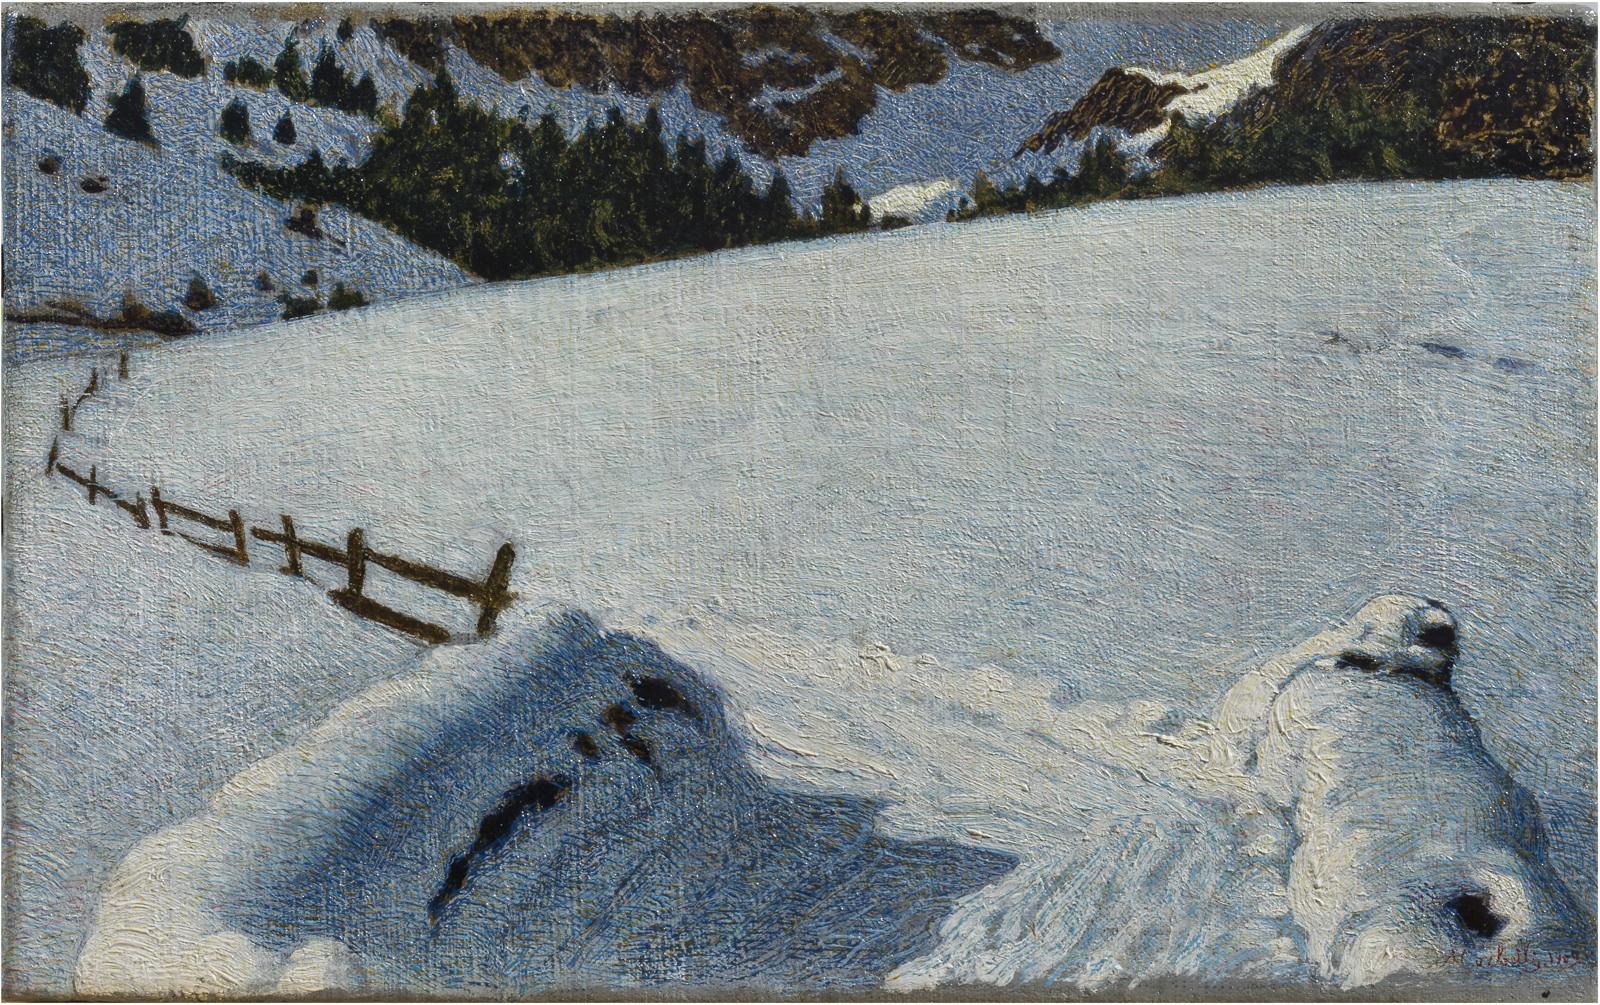 Neve - Morbelli A.